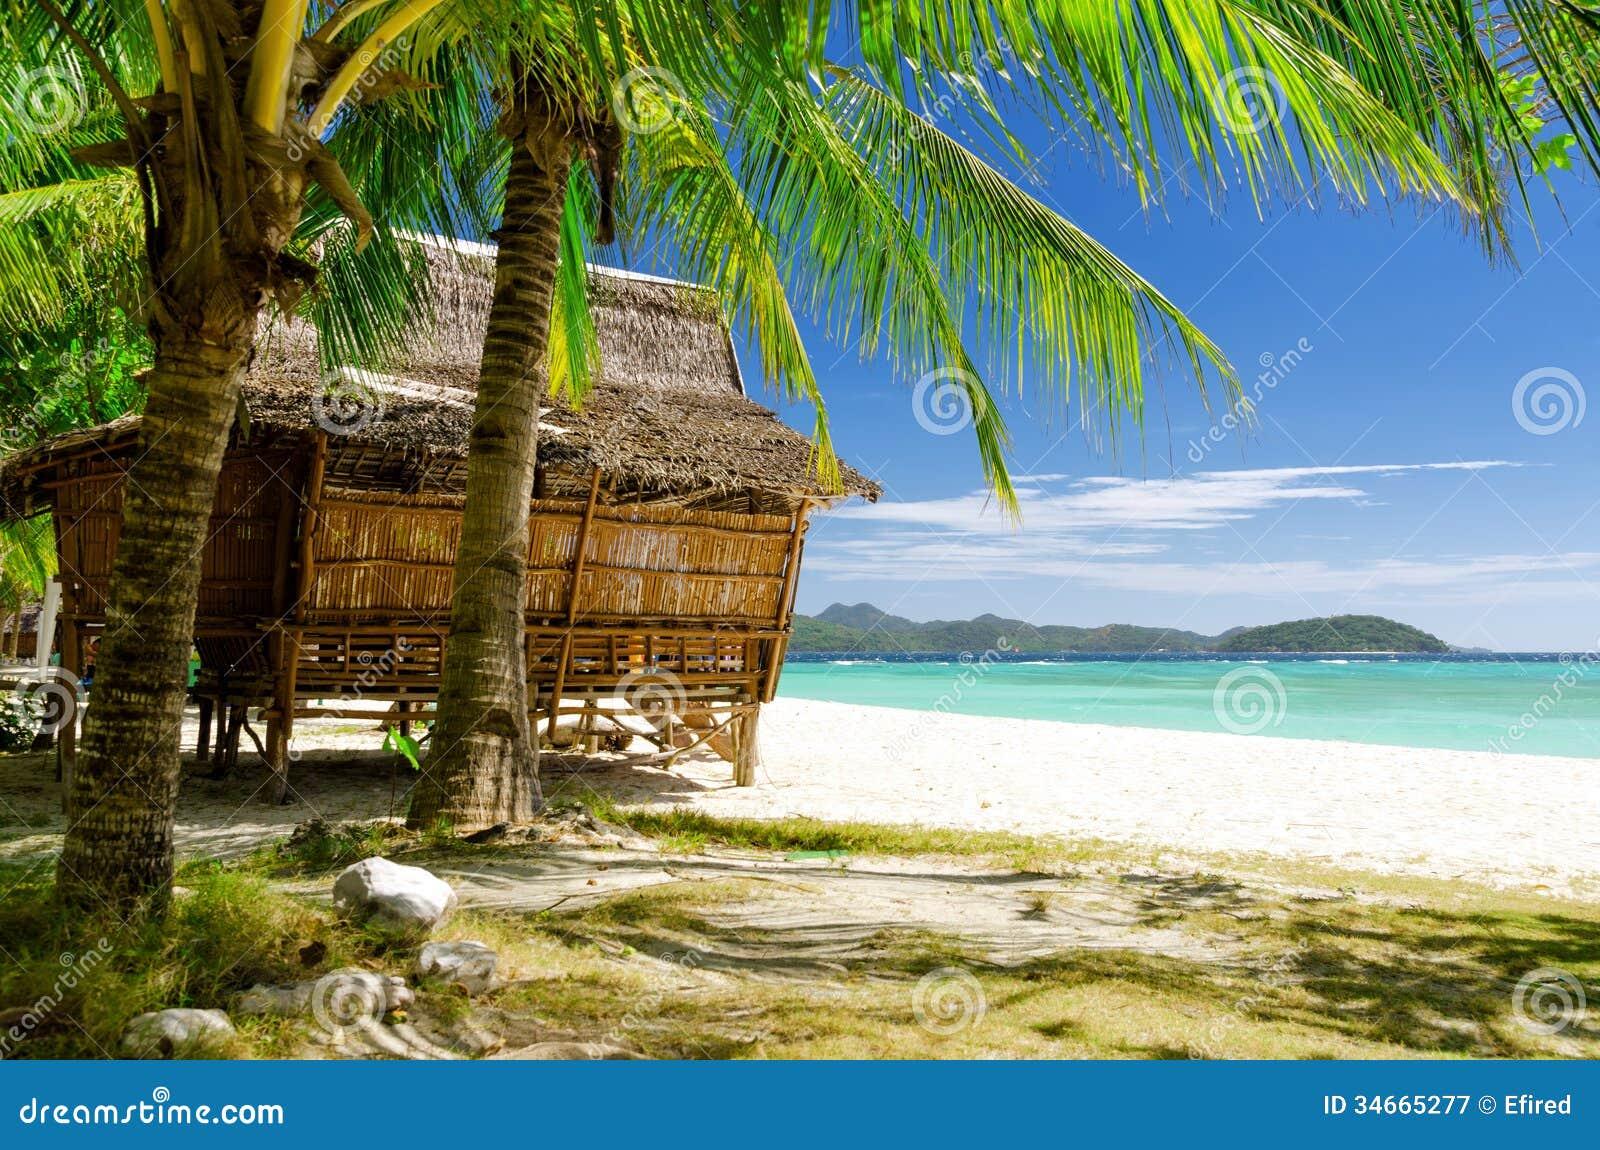 Tropical Beach Huts: Bamboo Hut On Tropical Beach Royalty Free Stock